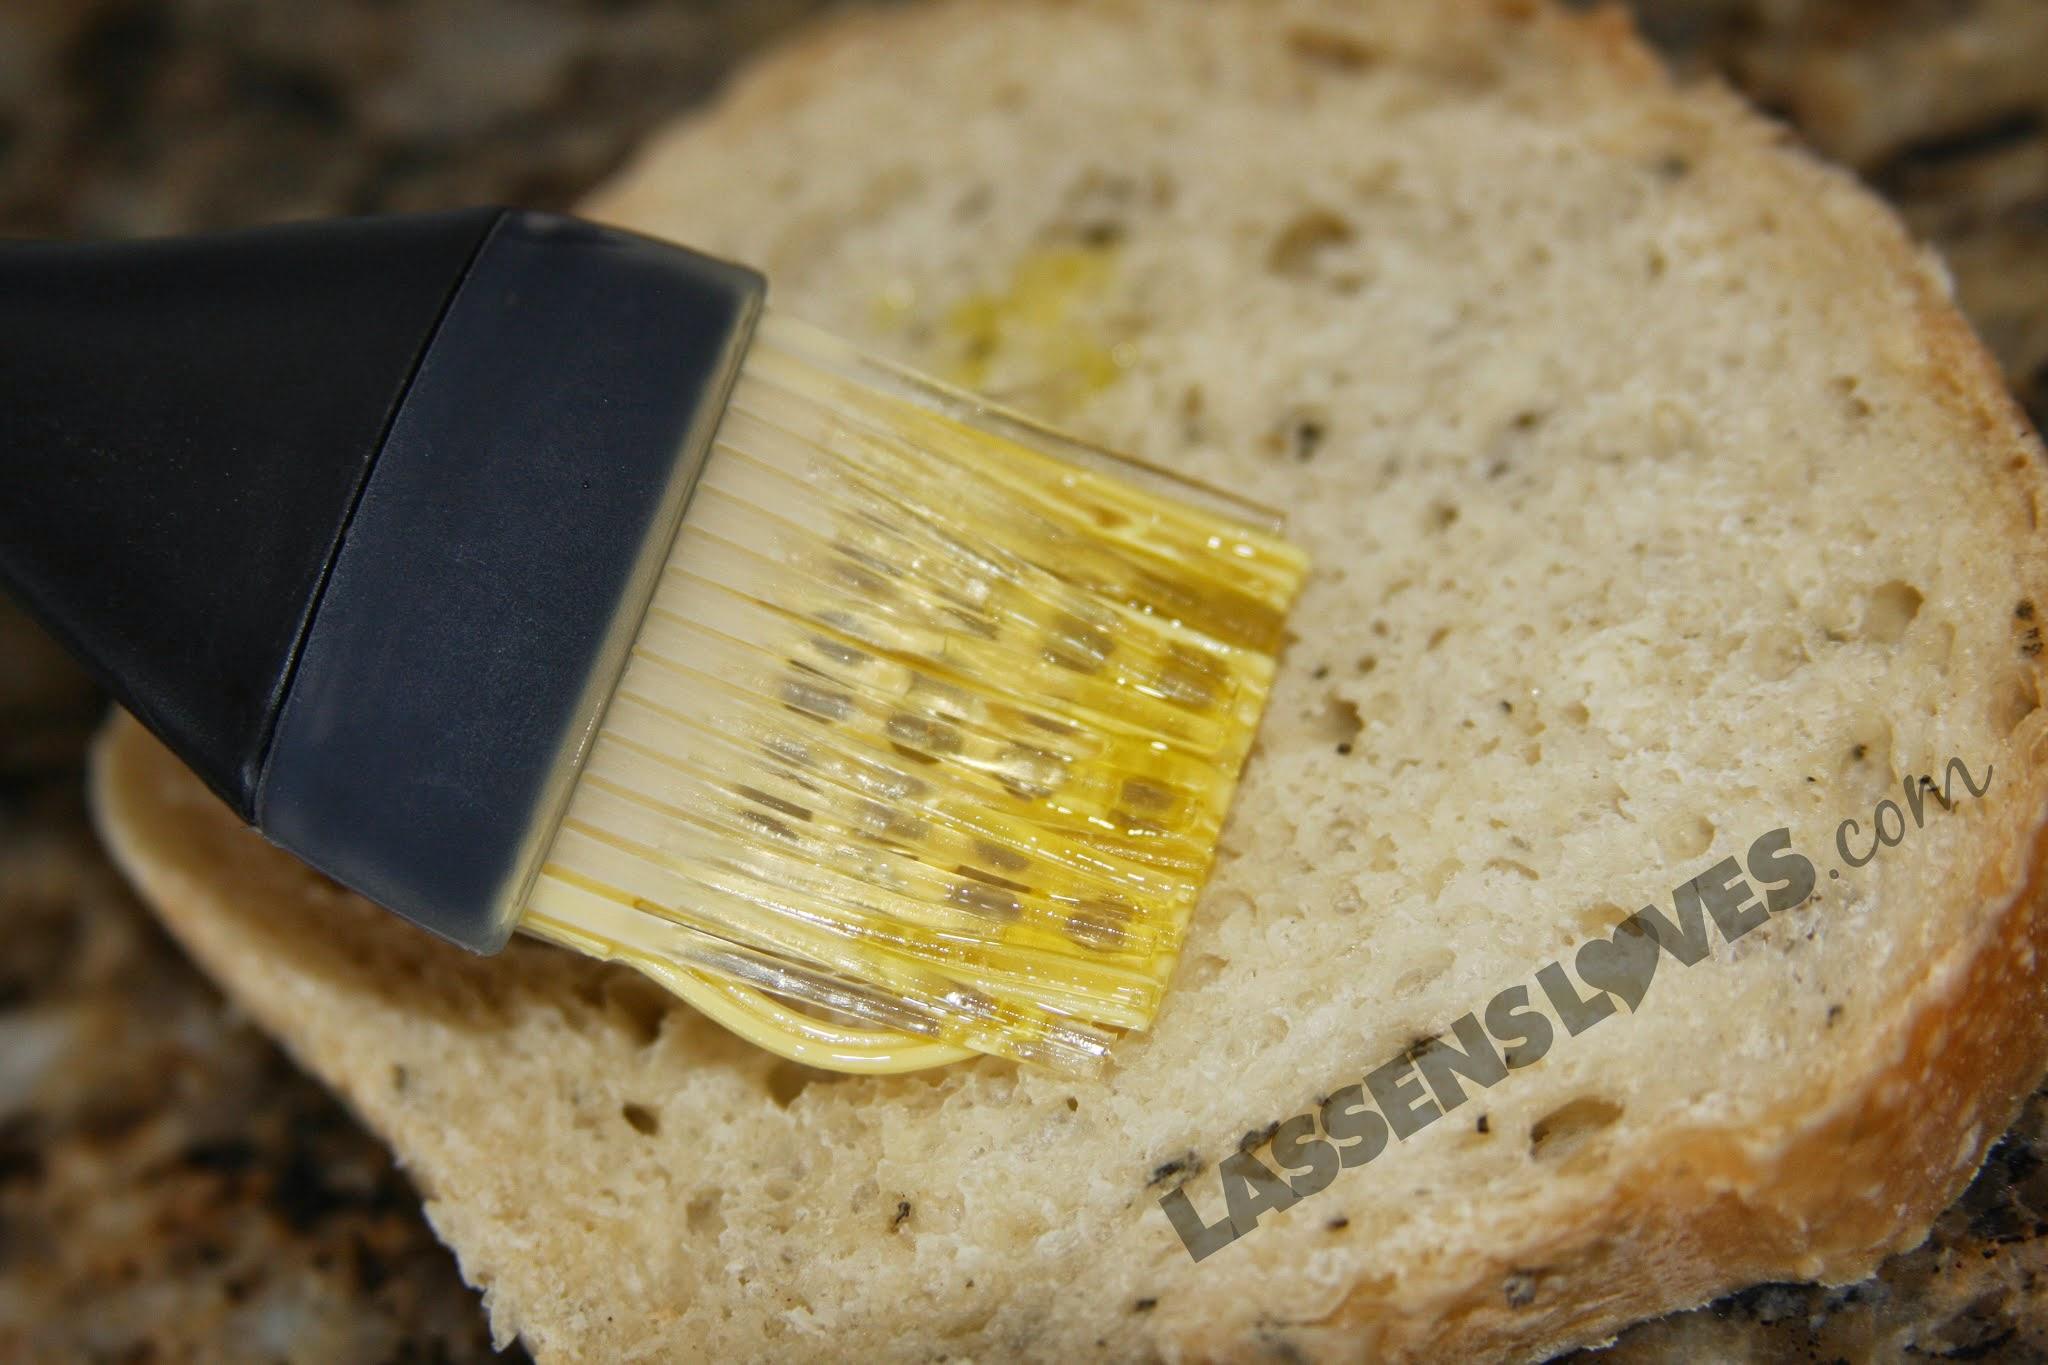 pesto+caprese+sandwich, caprese+panini, pesto+sandwich, pesto+caprese